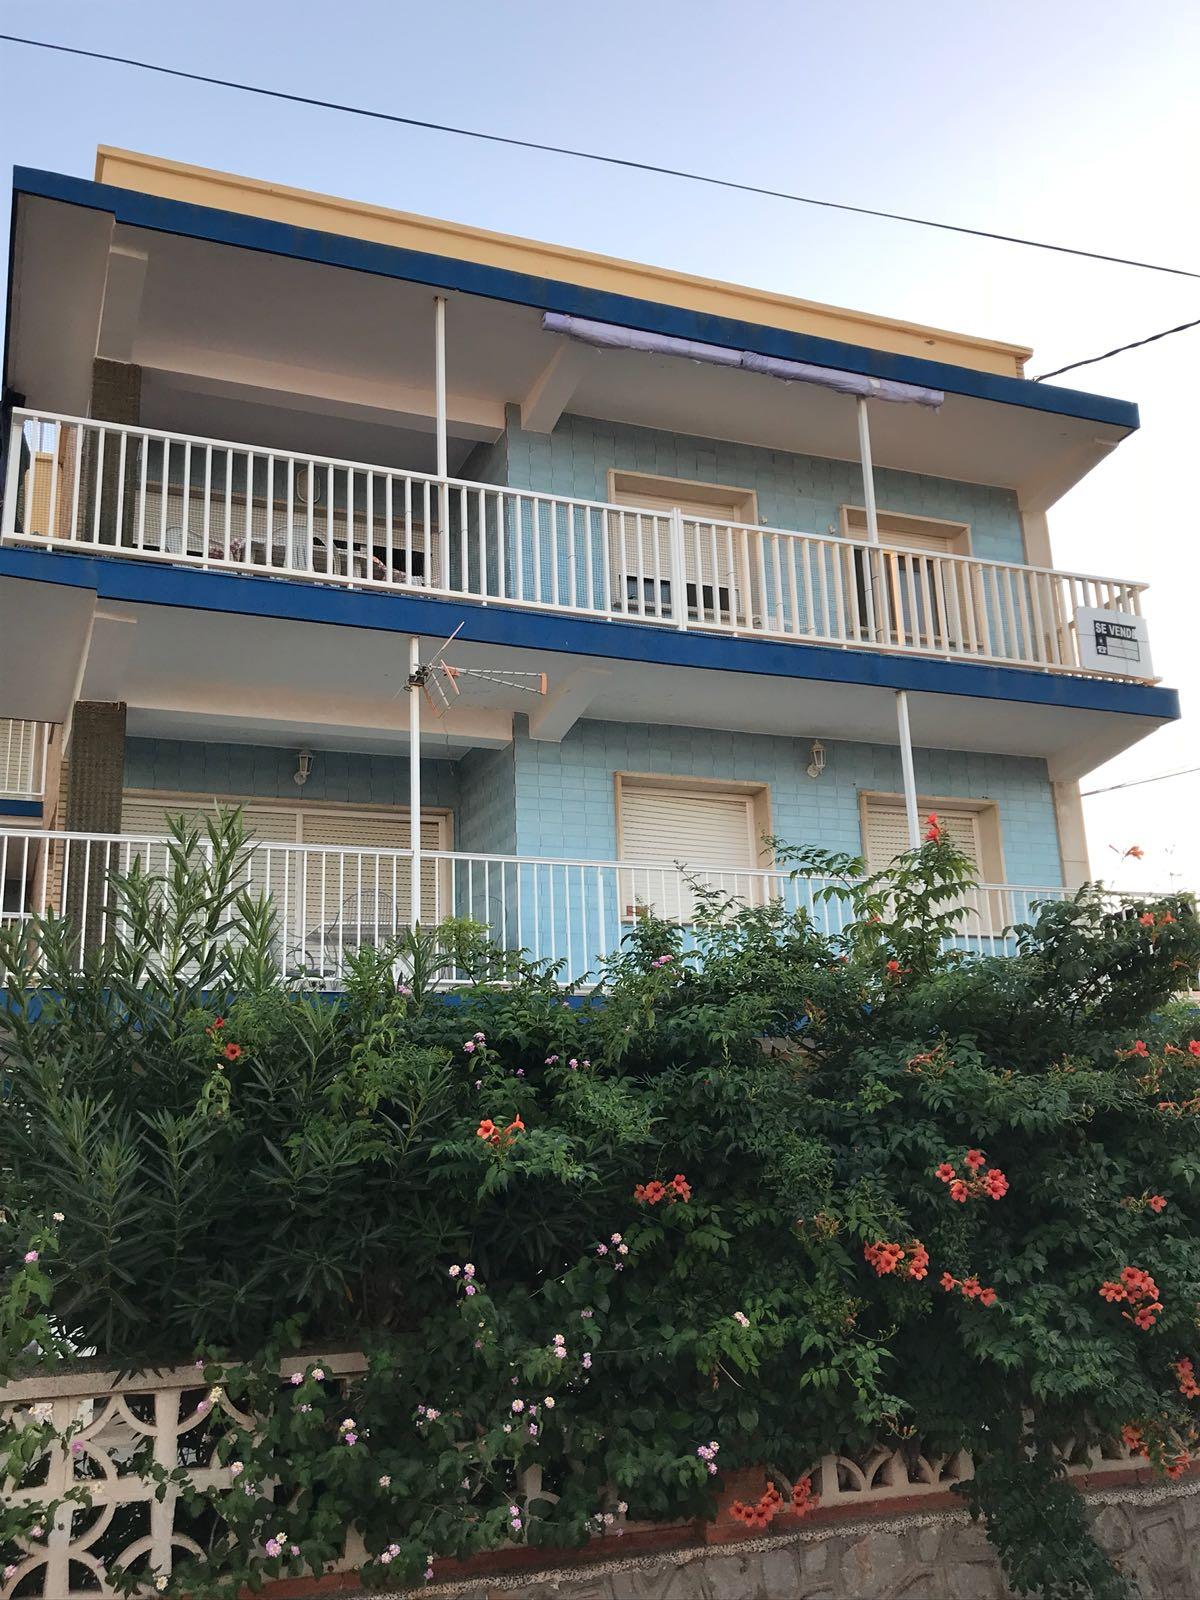 Ref:kf943381 Apartment For Sale in Mar de Cristal